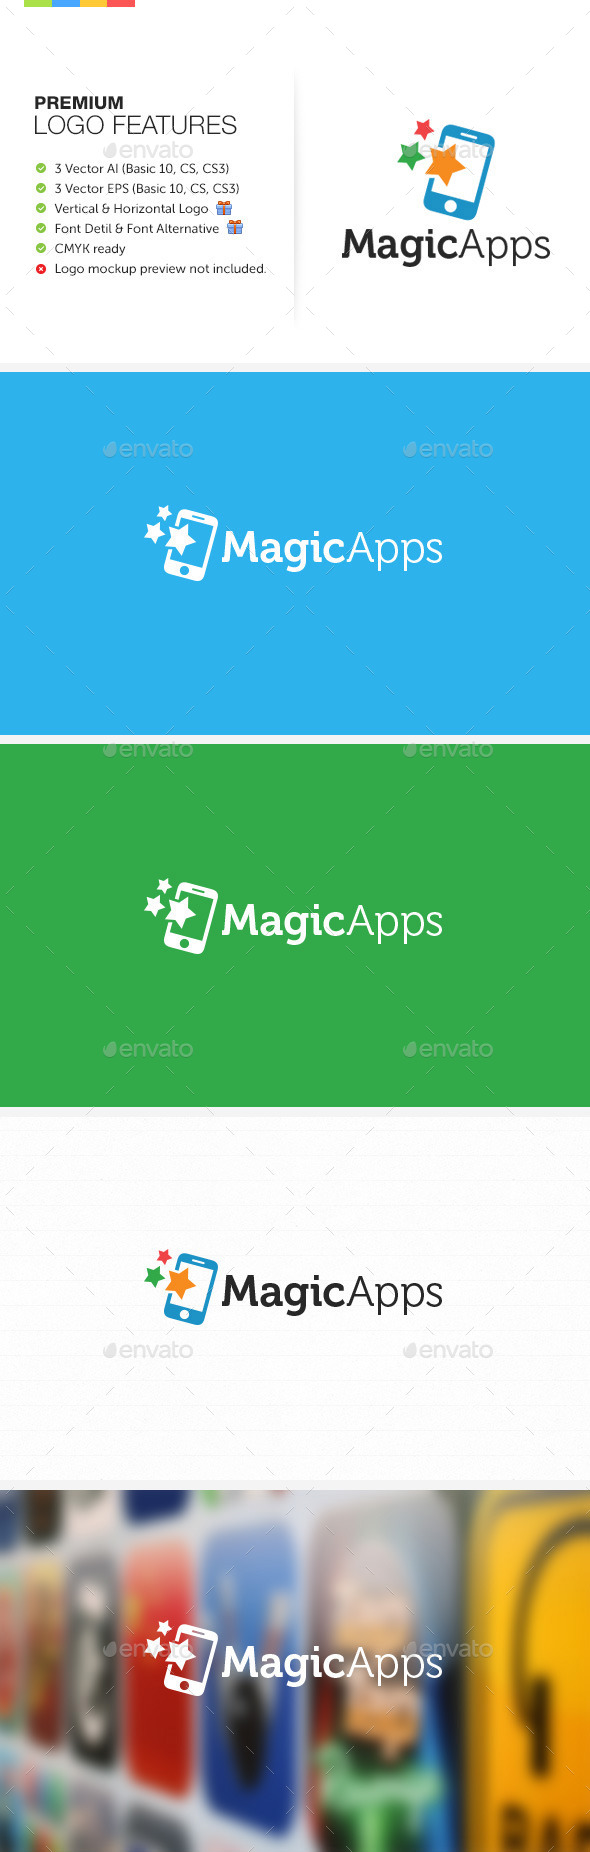 GraphicRiver Magic Apps Logo 8960009